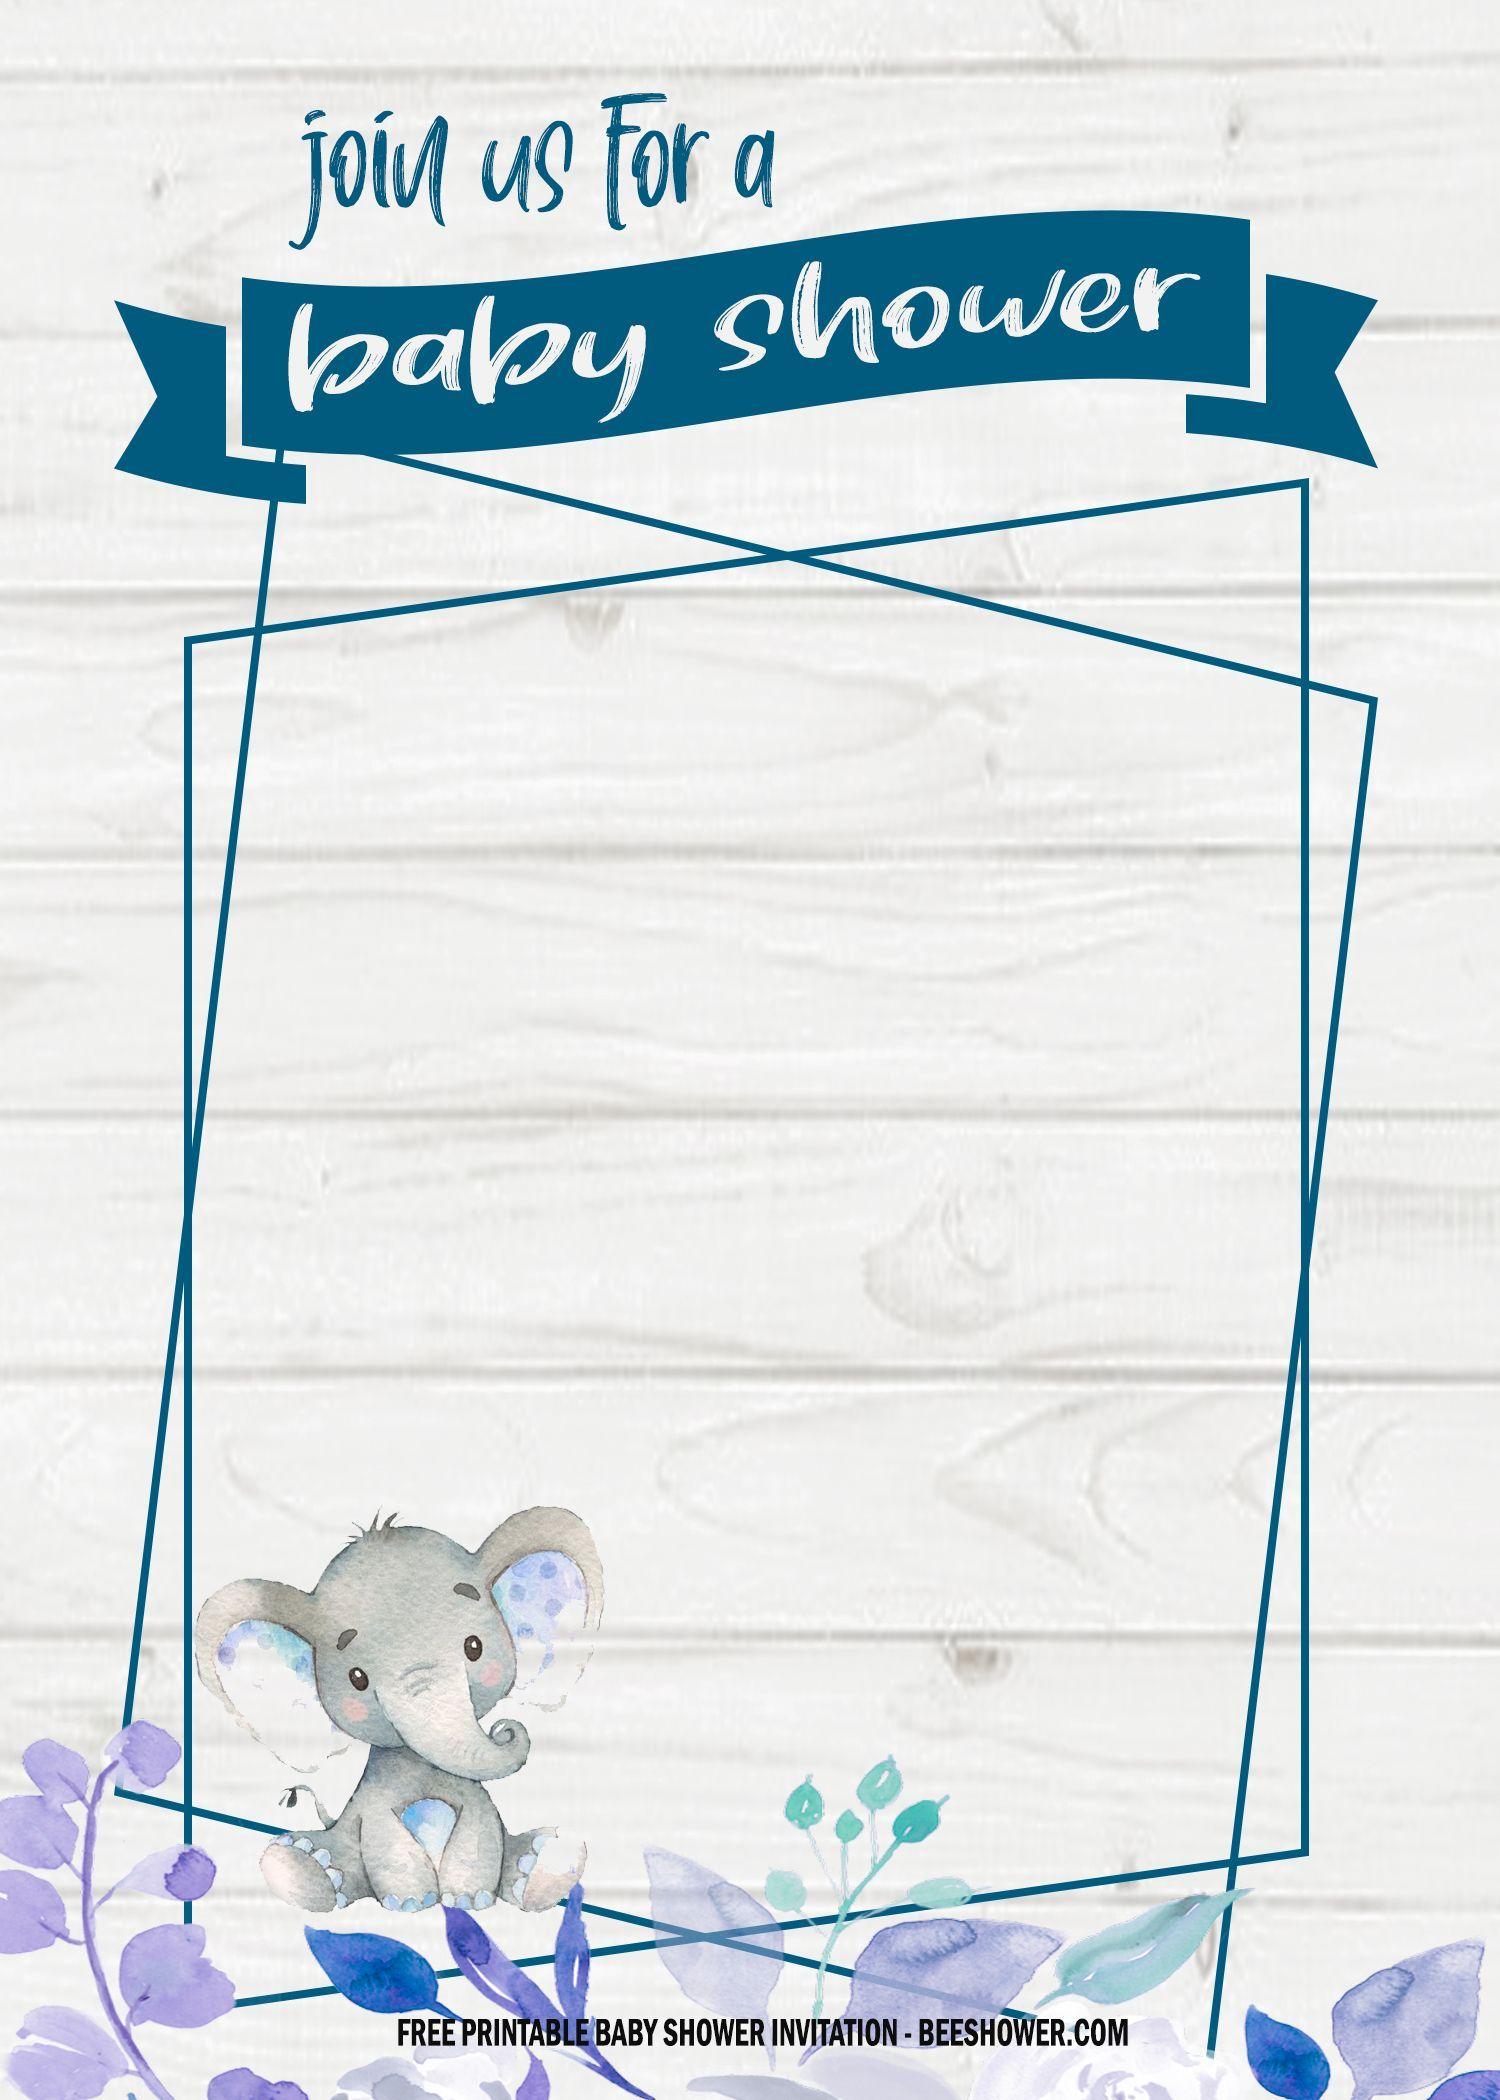 6 Free Blue Elephant Themed Birthday And Baby Shower Invitation Templates Boy Baby Shower Invitations Templates Printable Baby Shower Invitations Free Baby Shower Invitations